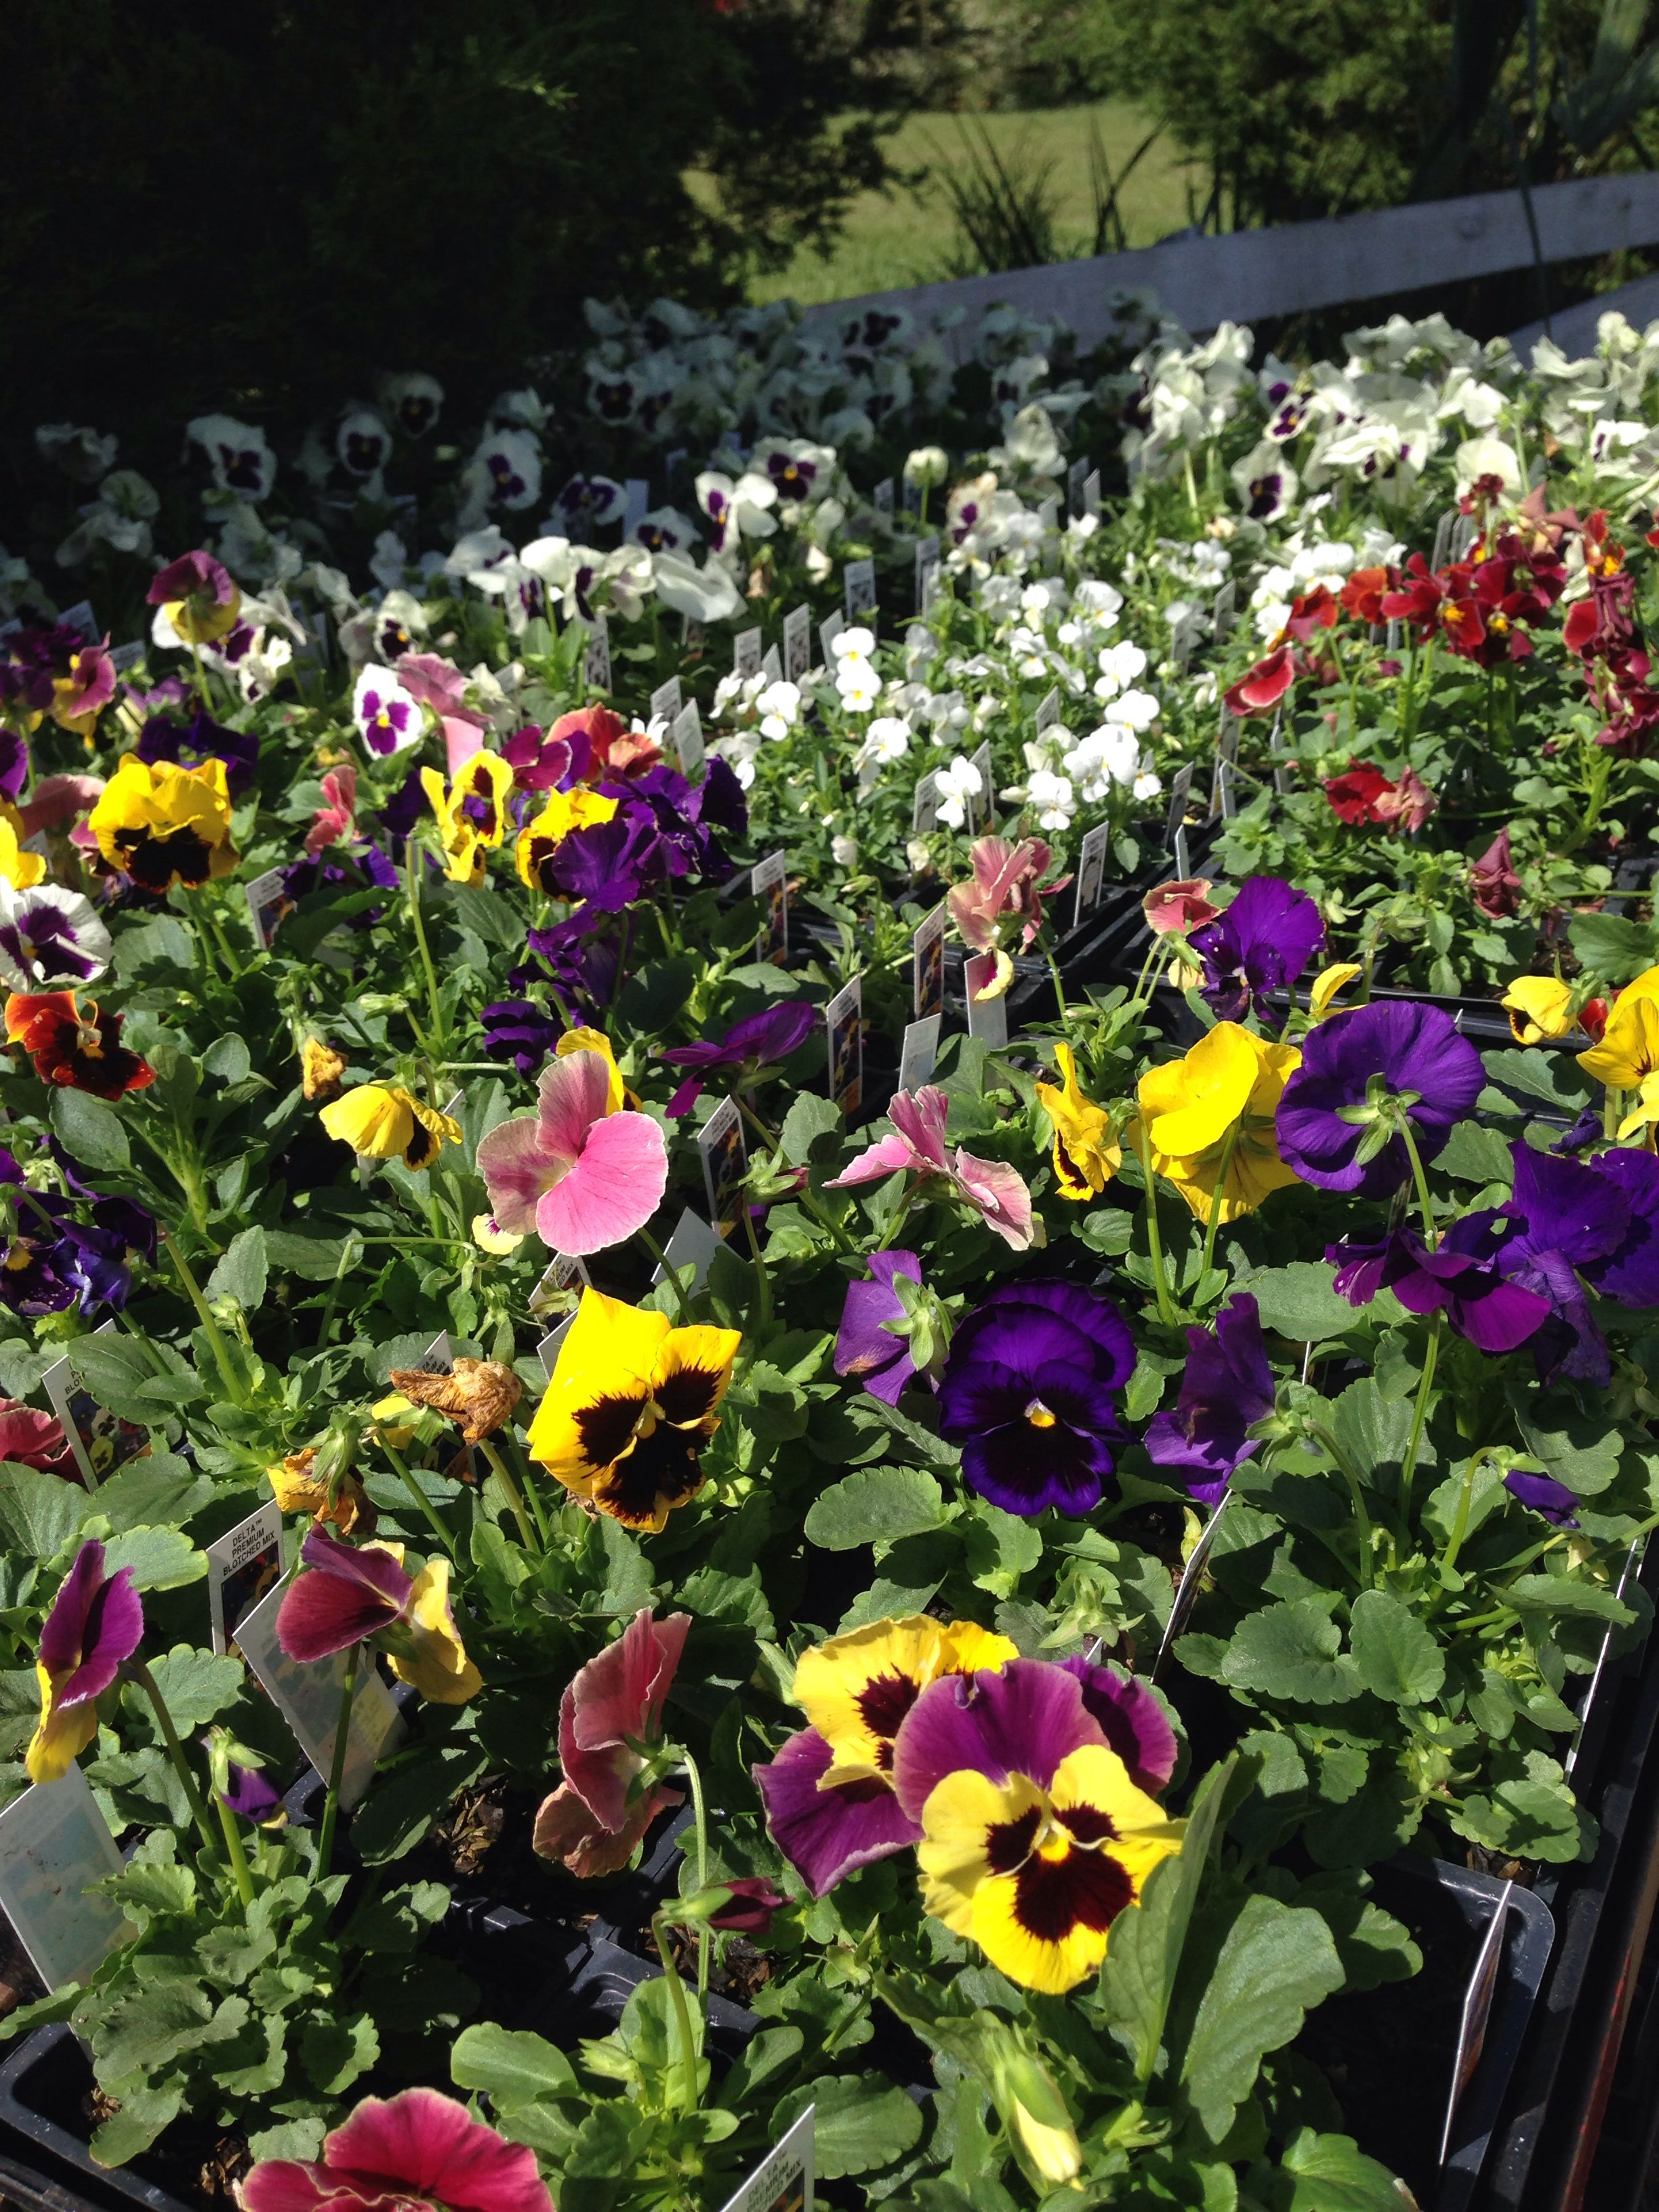 Pansies-Bob Wines Camellia Gardens-Ocala, Fl